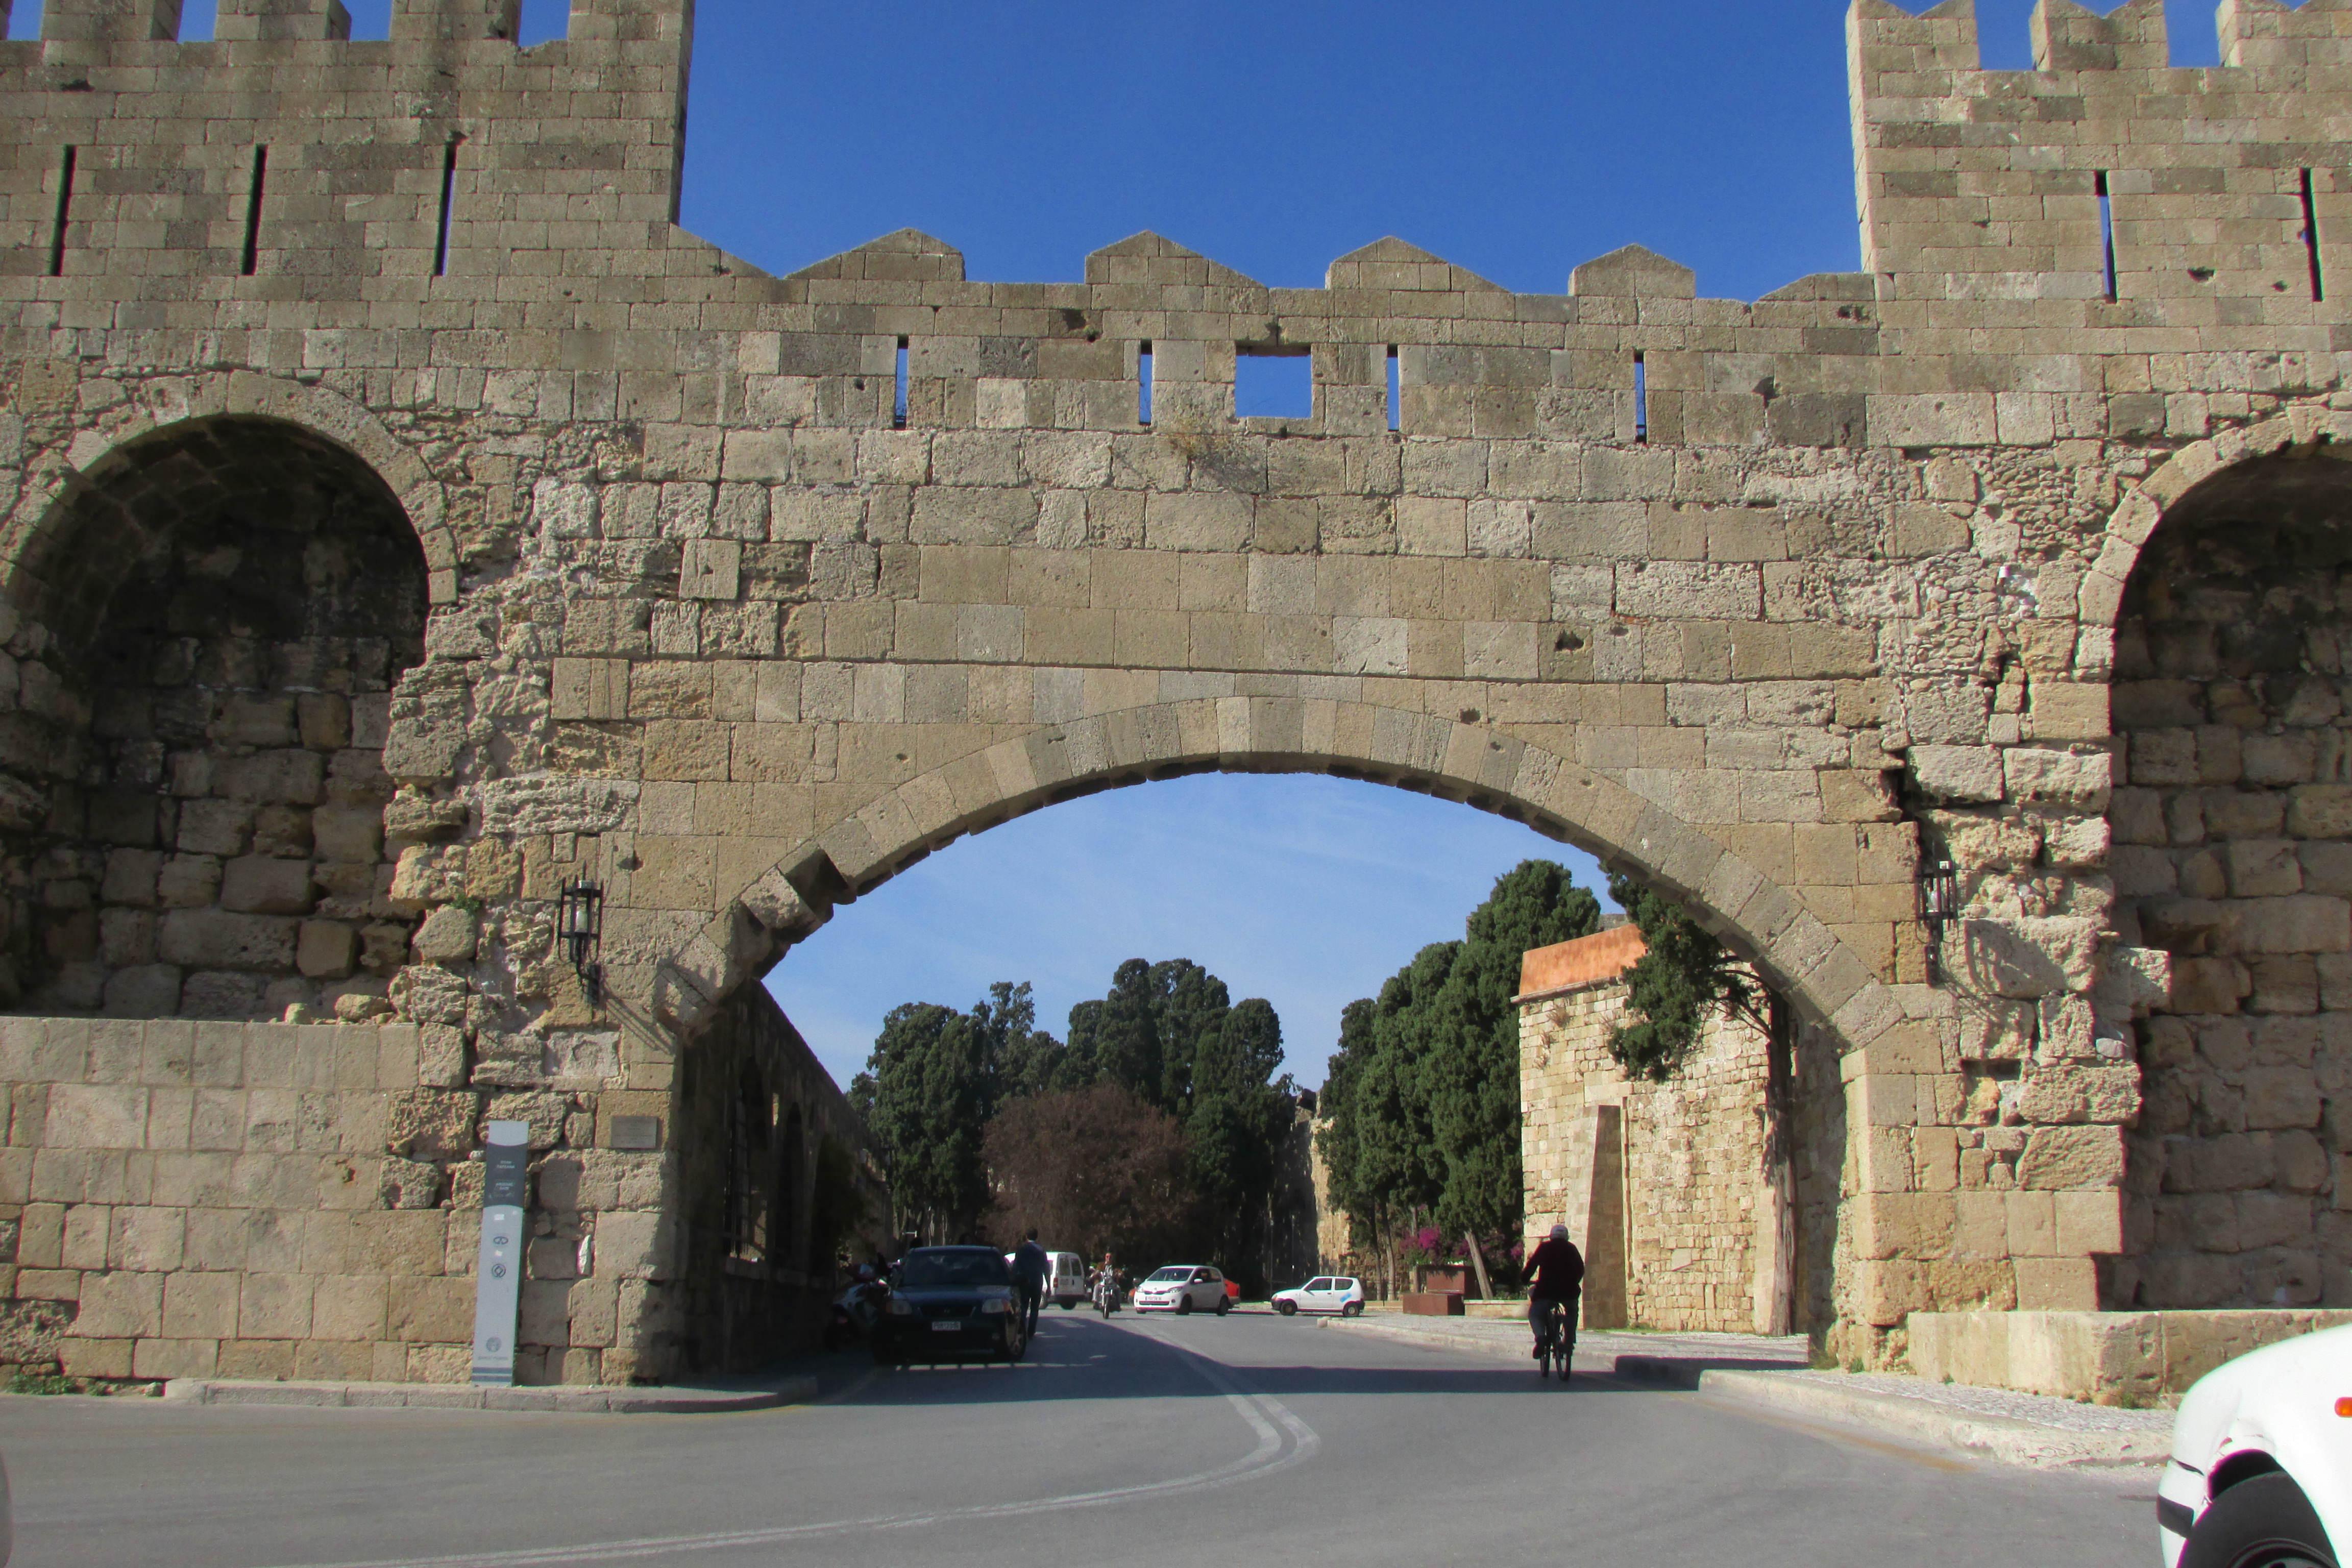 Brama Starego Miasta